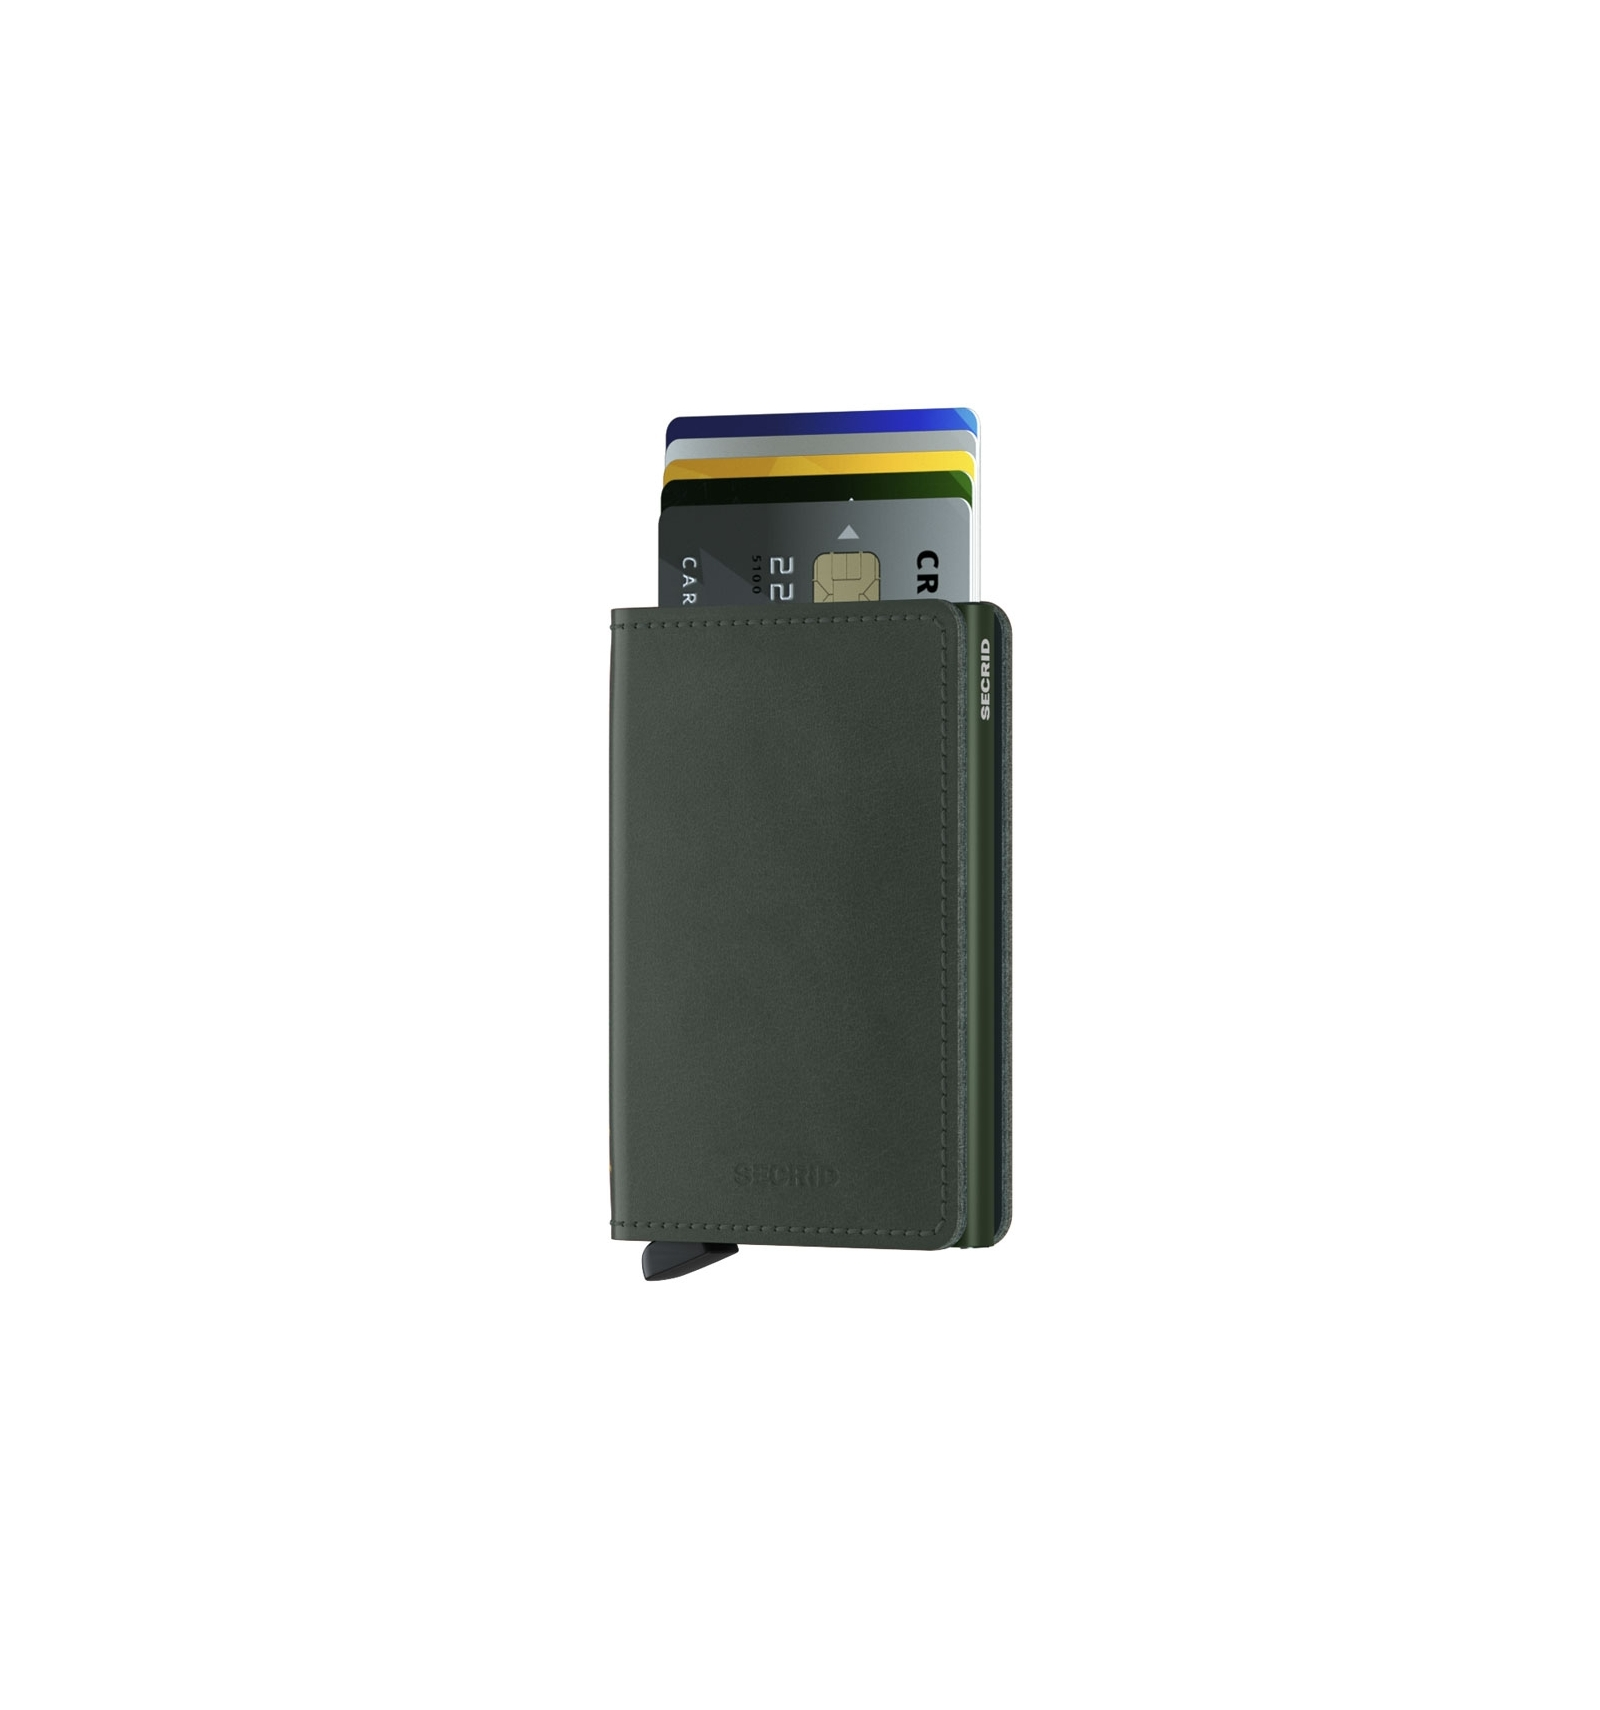 https://osez-sophie.com/4468-thickbox_default/porte-carte-secrid-aluminium-slimwallet-cuir-original-vert.jpg